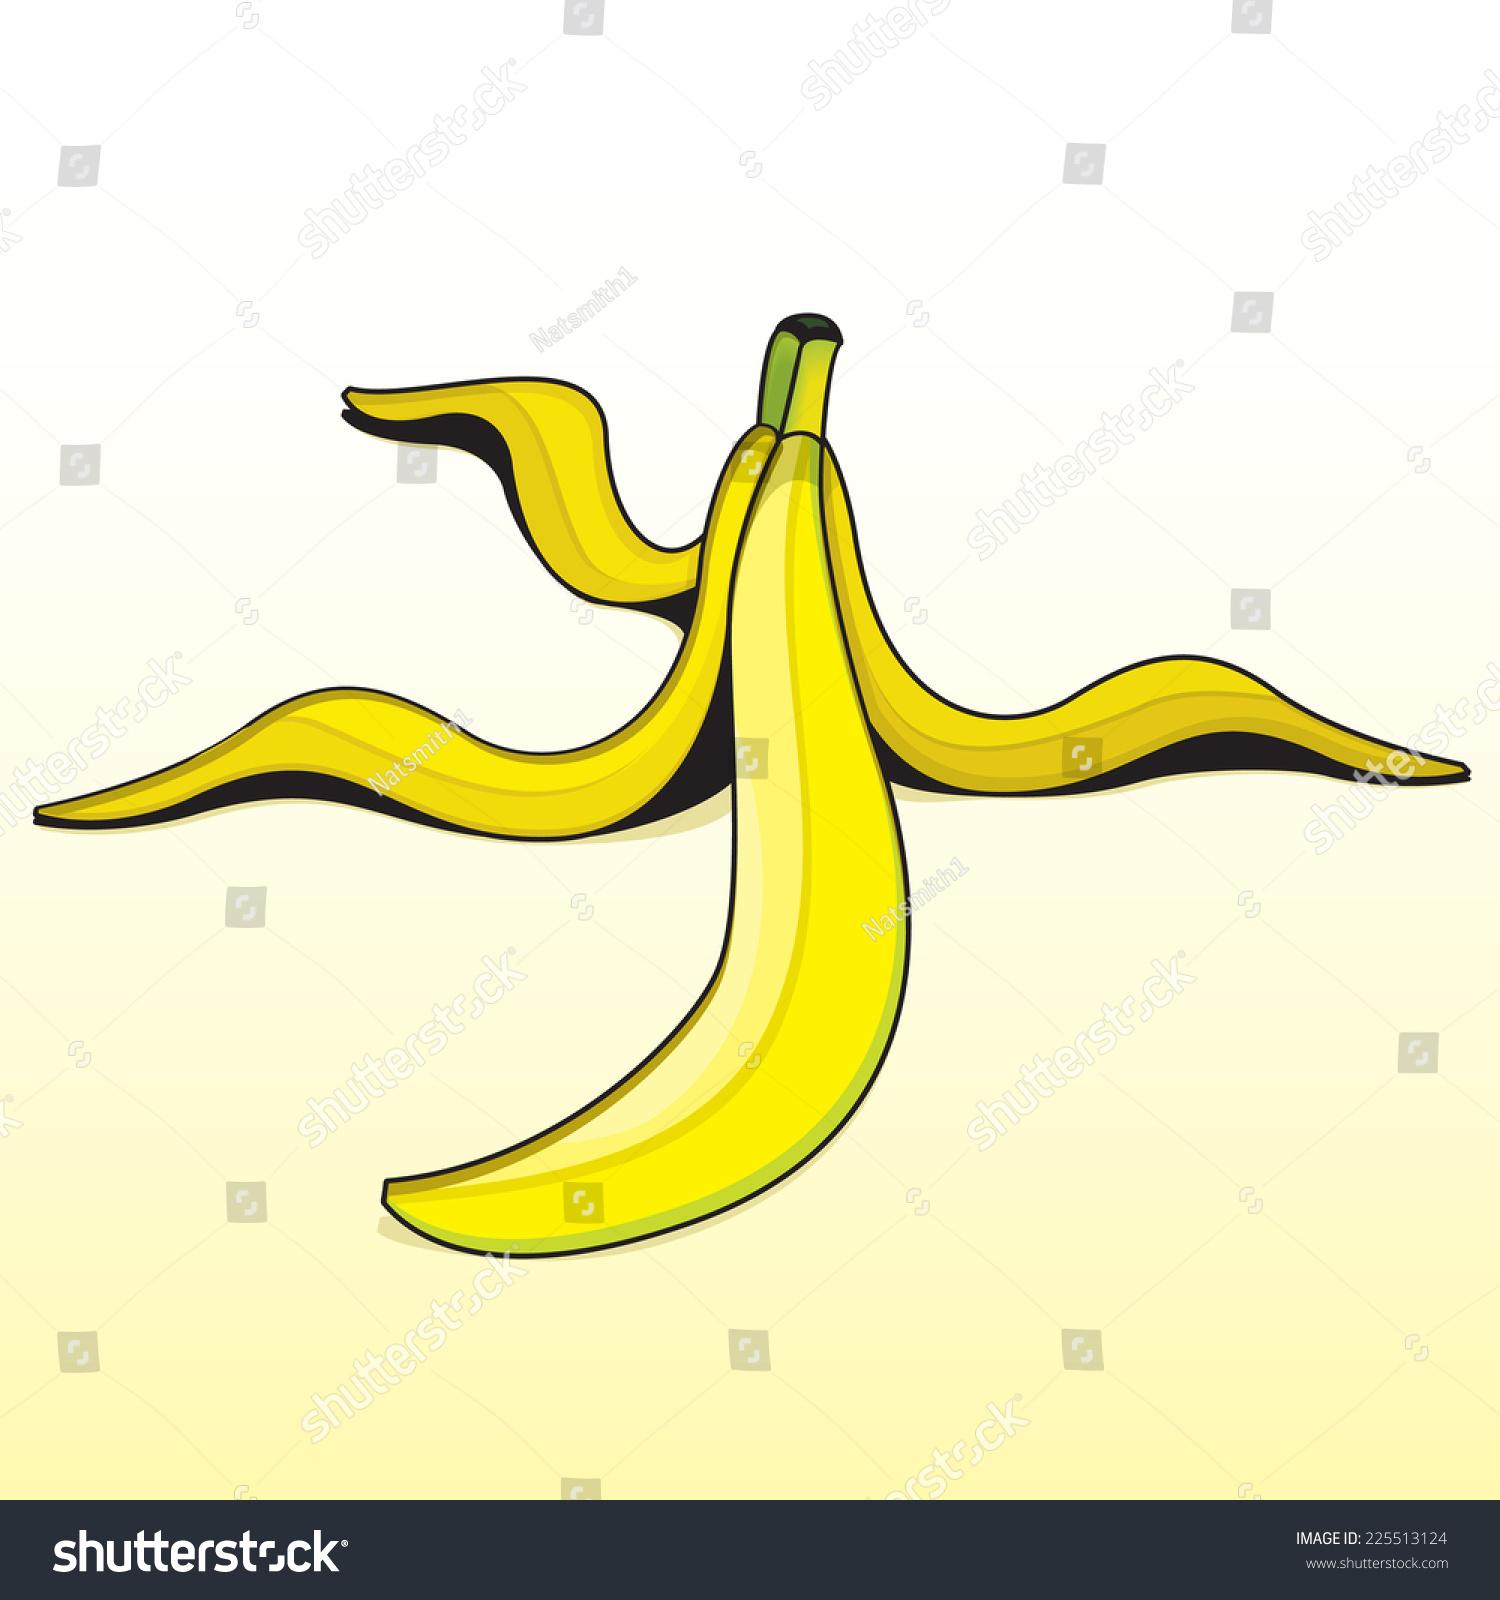 Vector Drawing Banana Peel Easy Edit Stock Vector Royalty Free